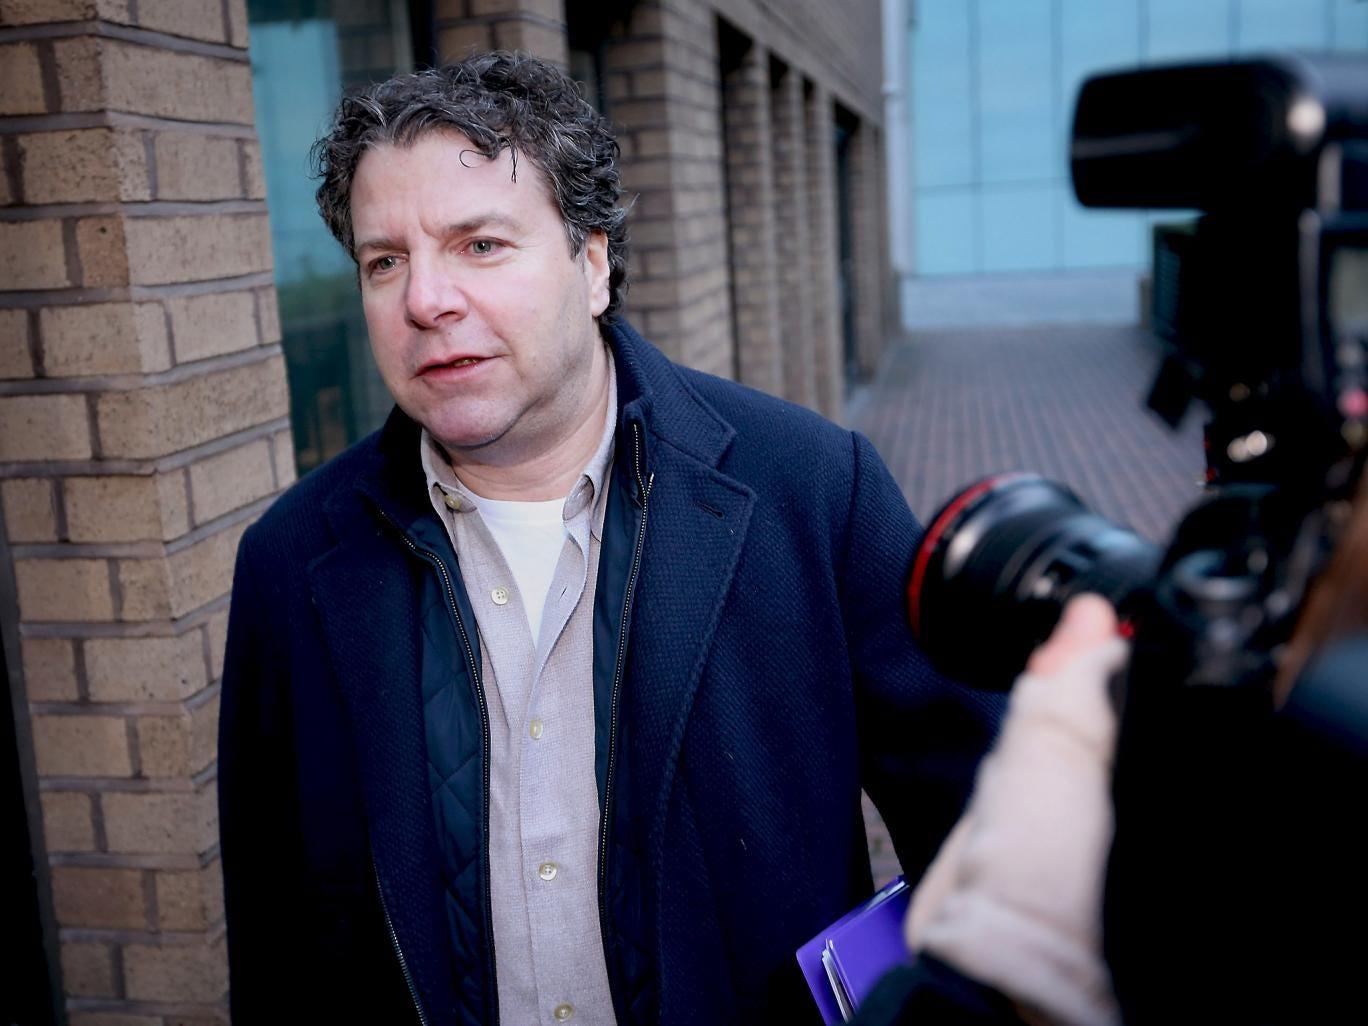 5 November 2012: Nicholas Levene before he was sentenced for a £32m fraud